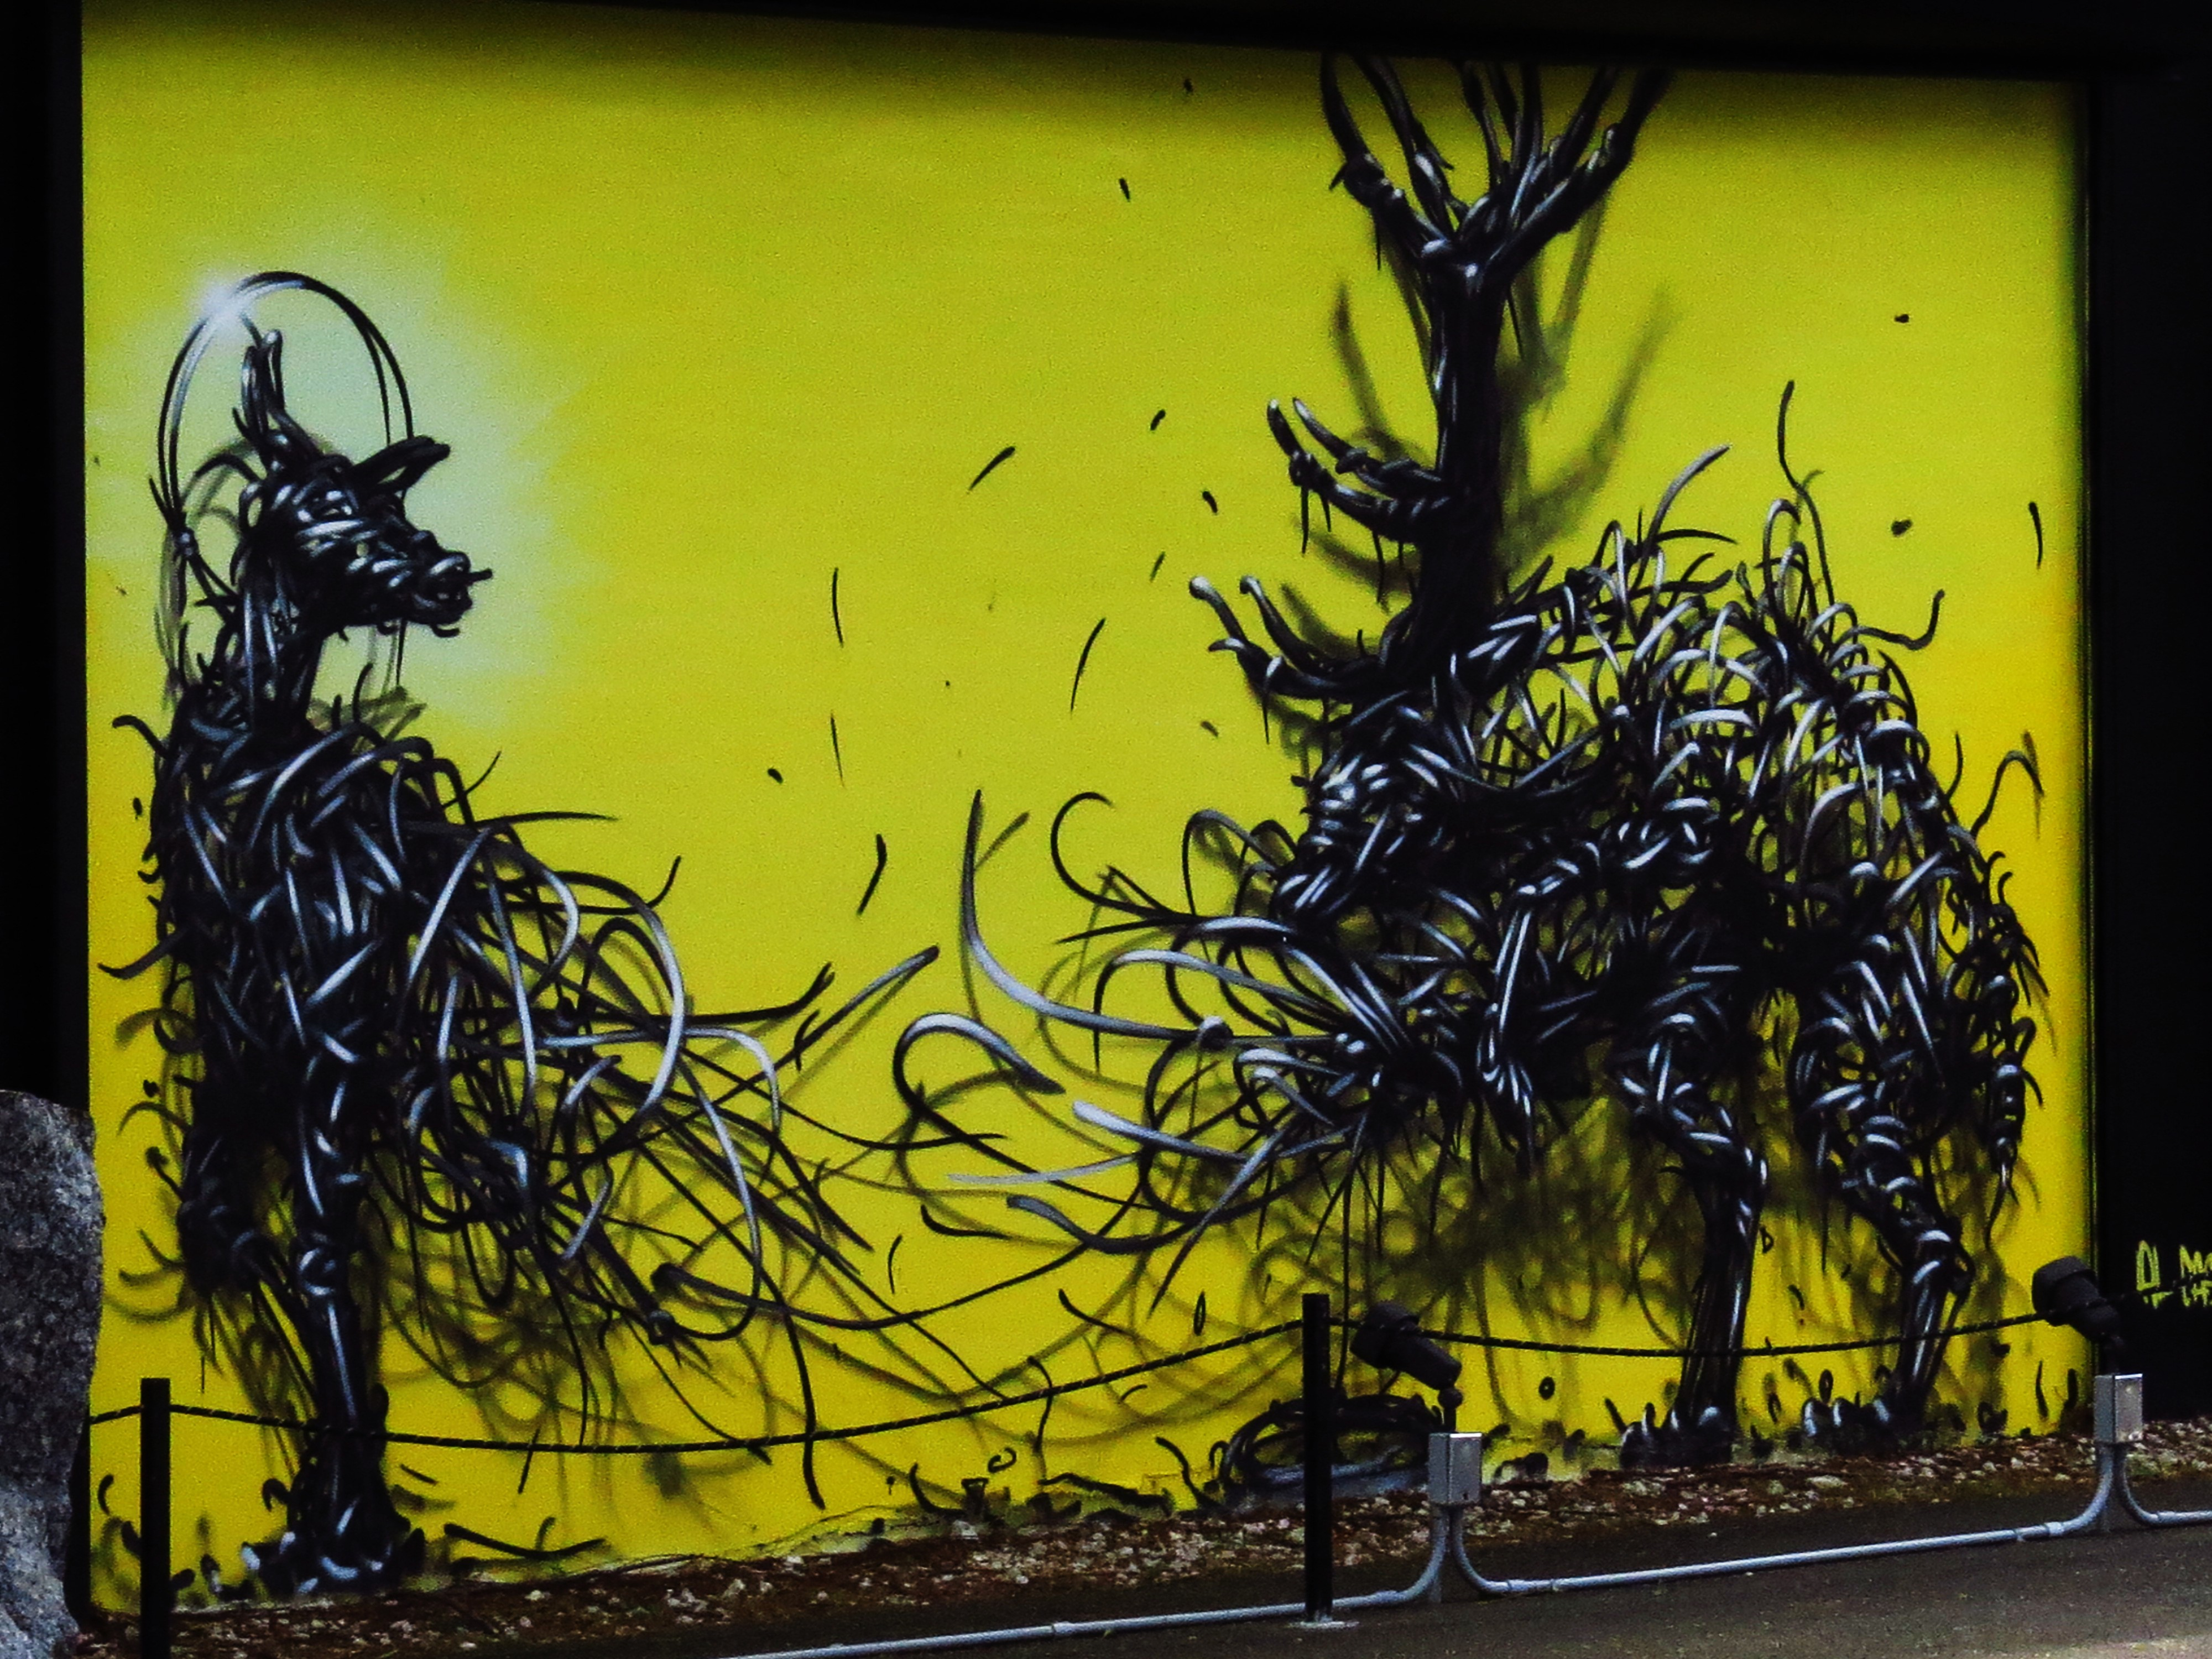 MIAMI STREET ART: WYNWOOD WALLS – TOKIDOKI (NOMAD)